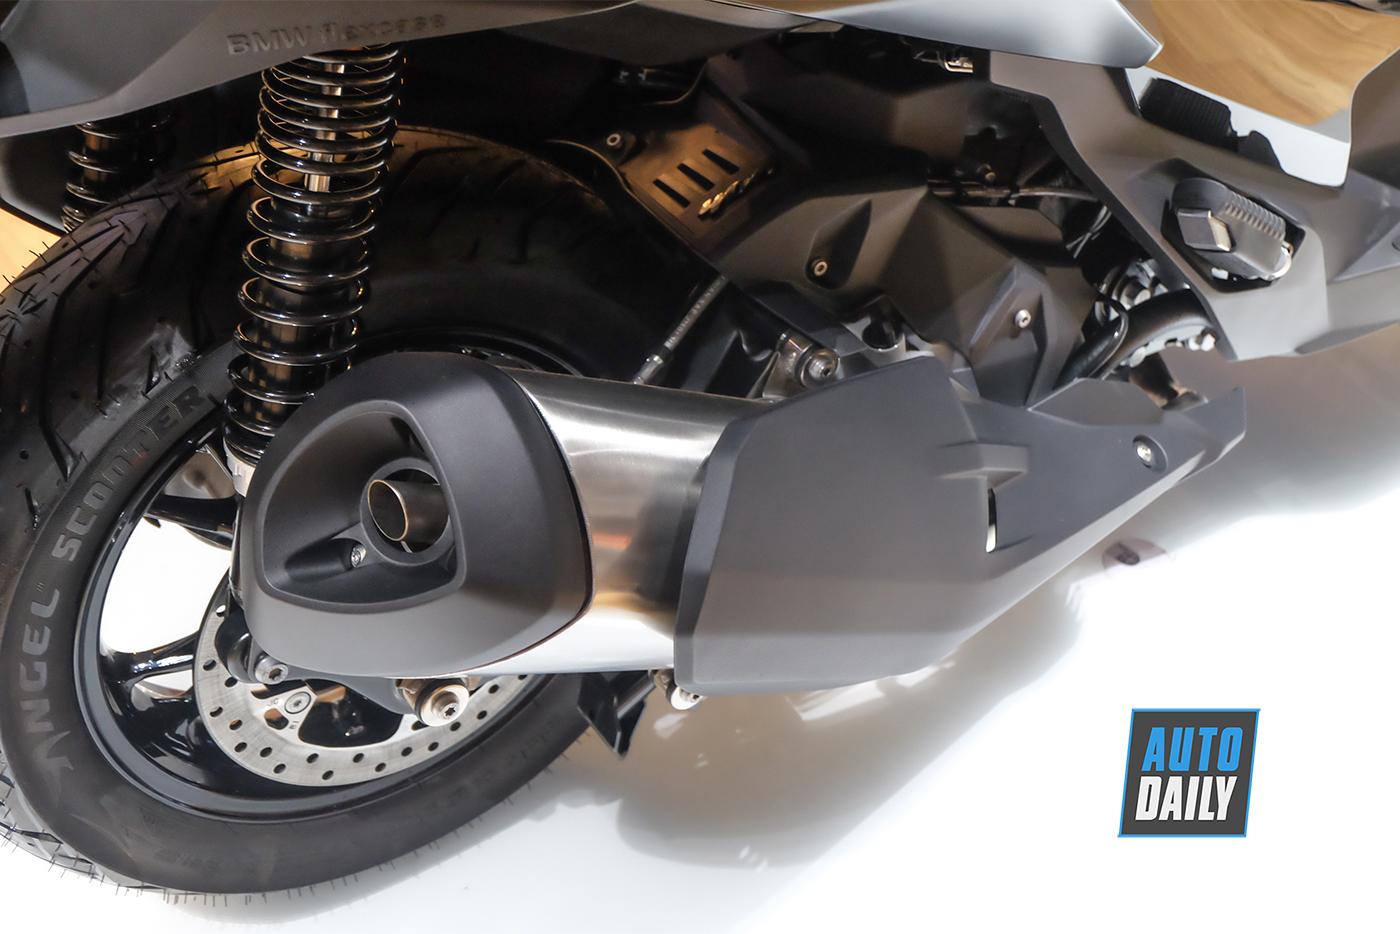 bmw-motorrad-c400x-16.jpg